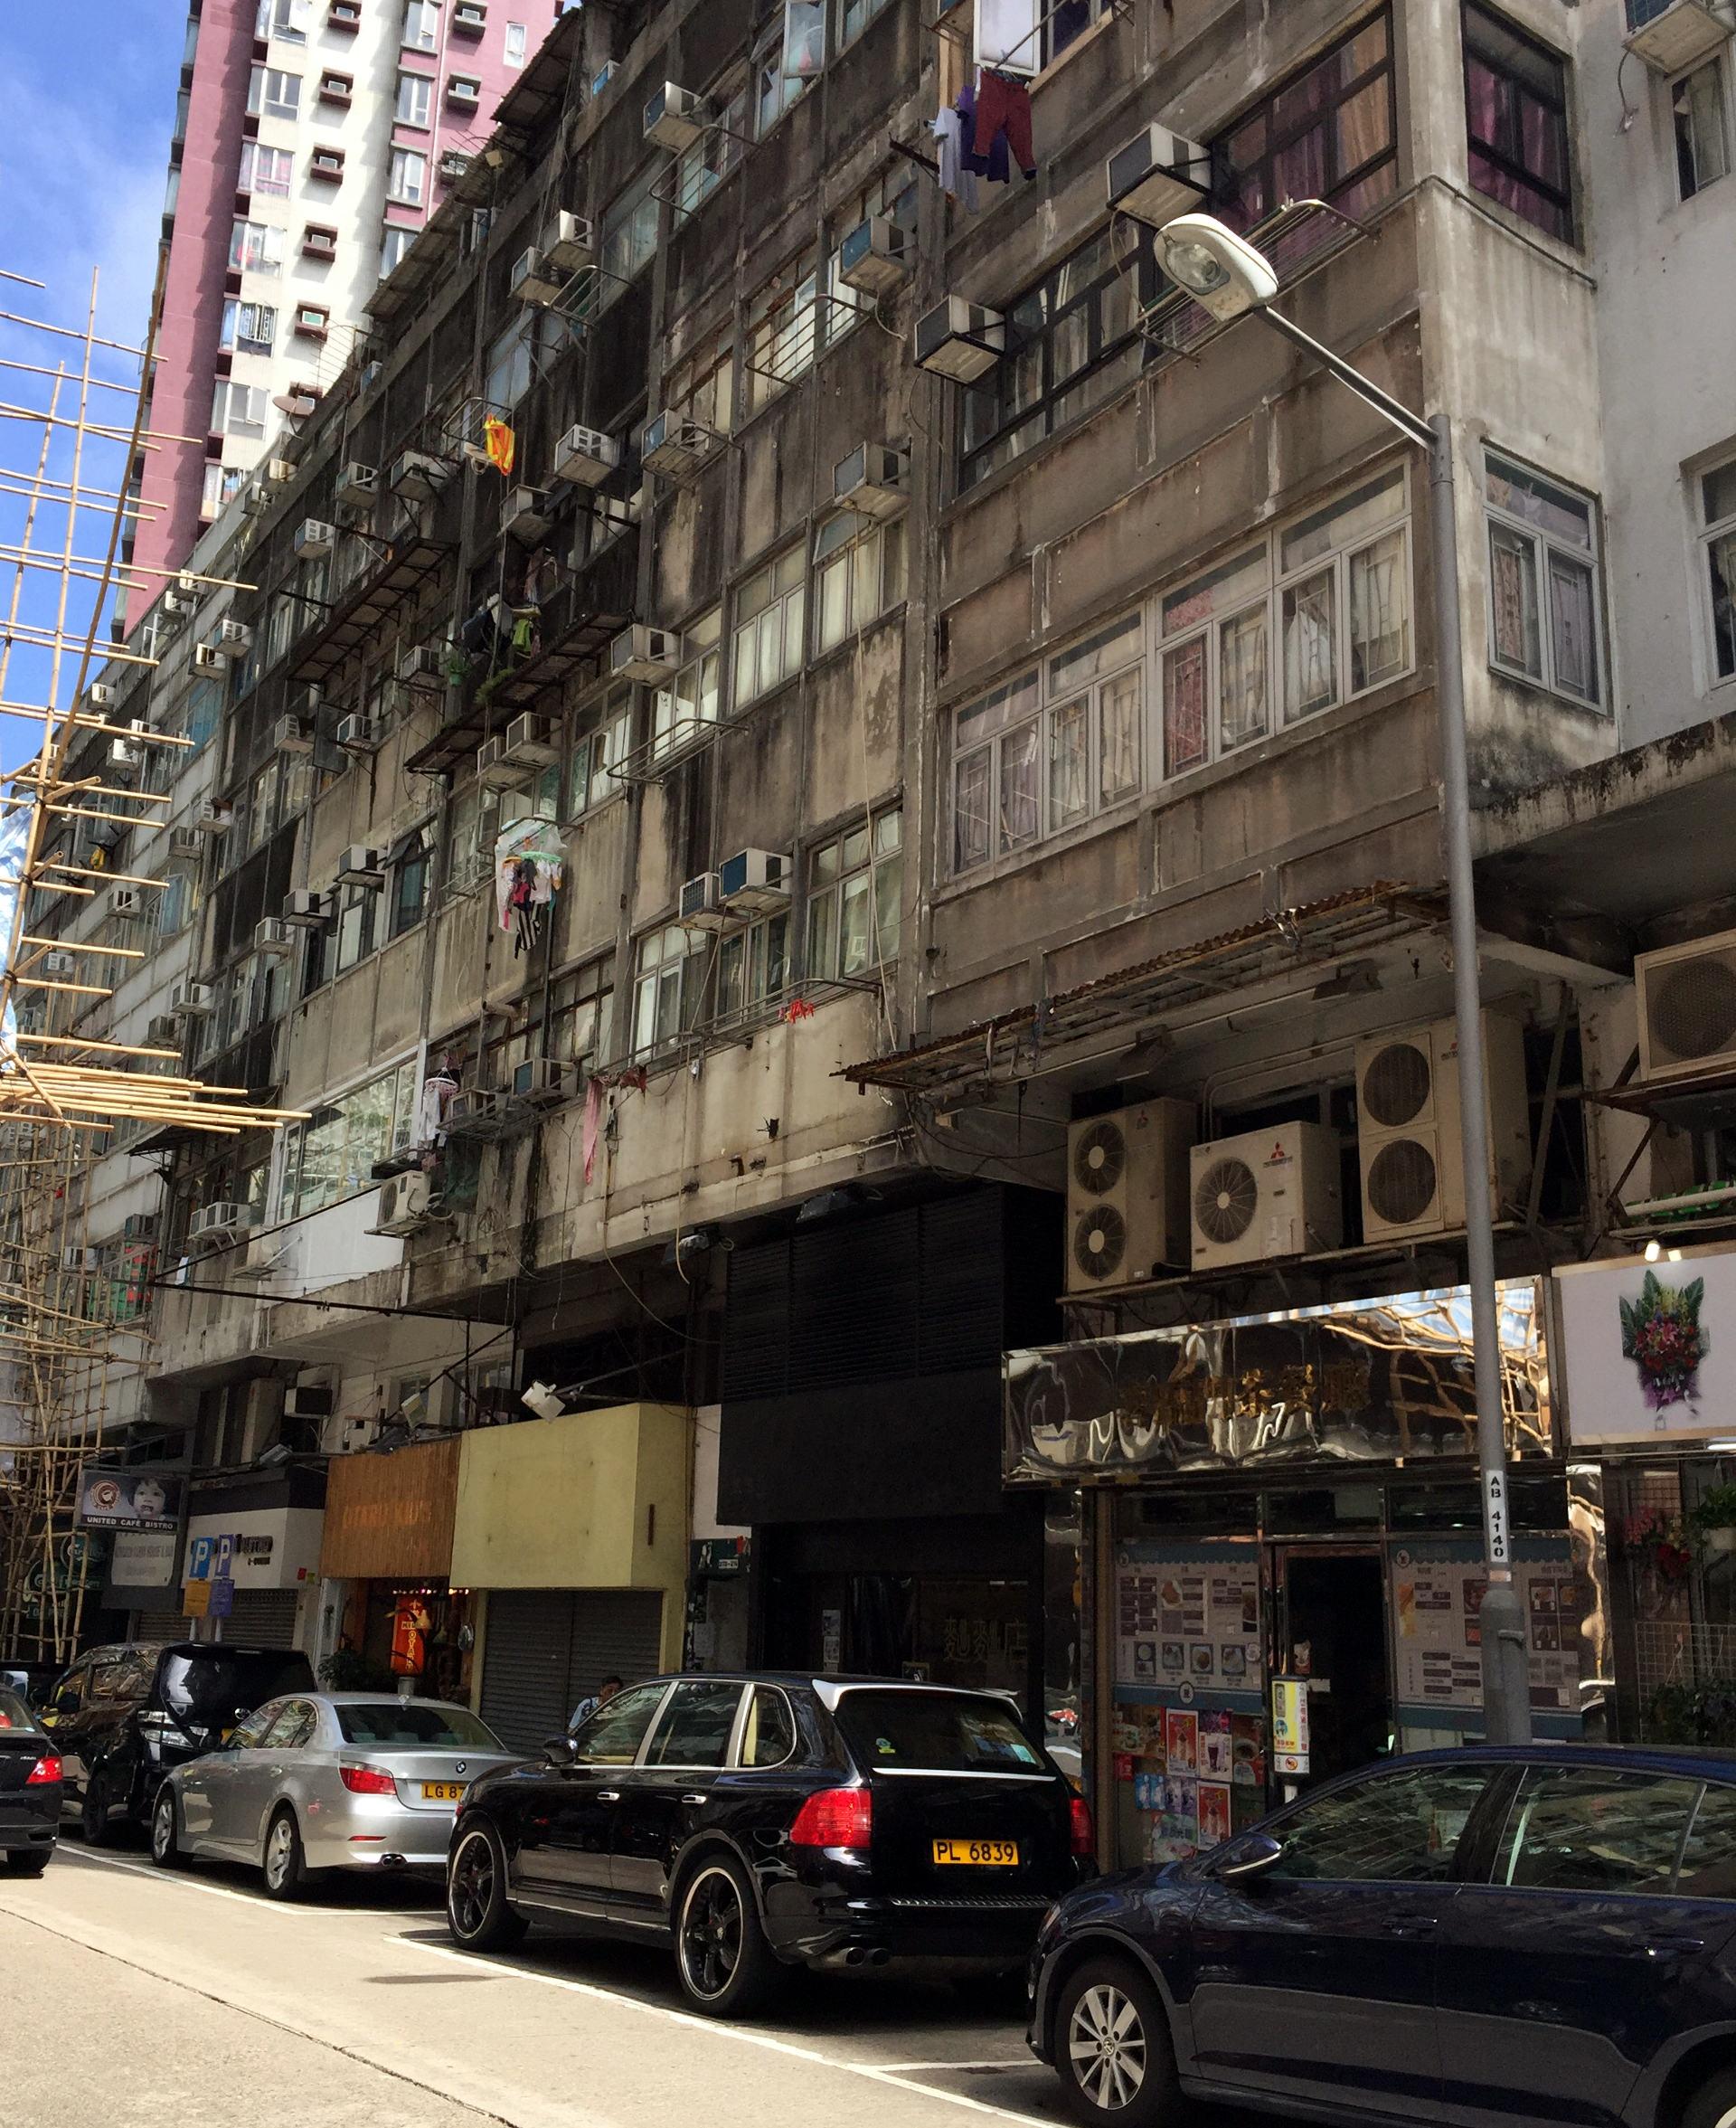 hongkong ulica miasto iglawpodrozy